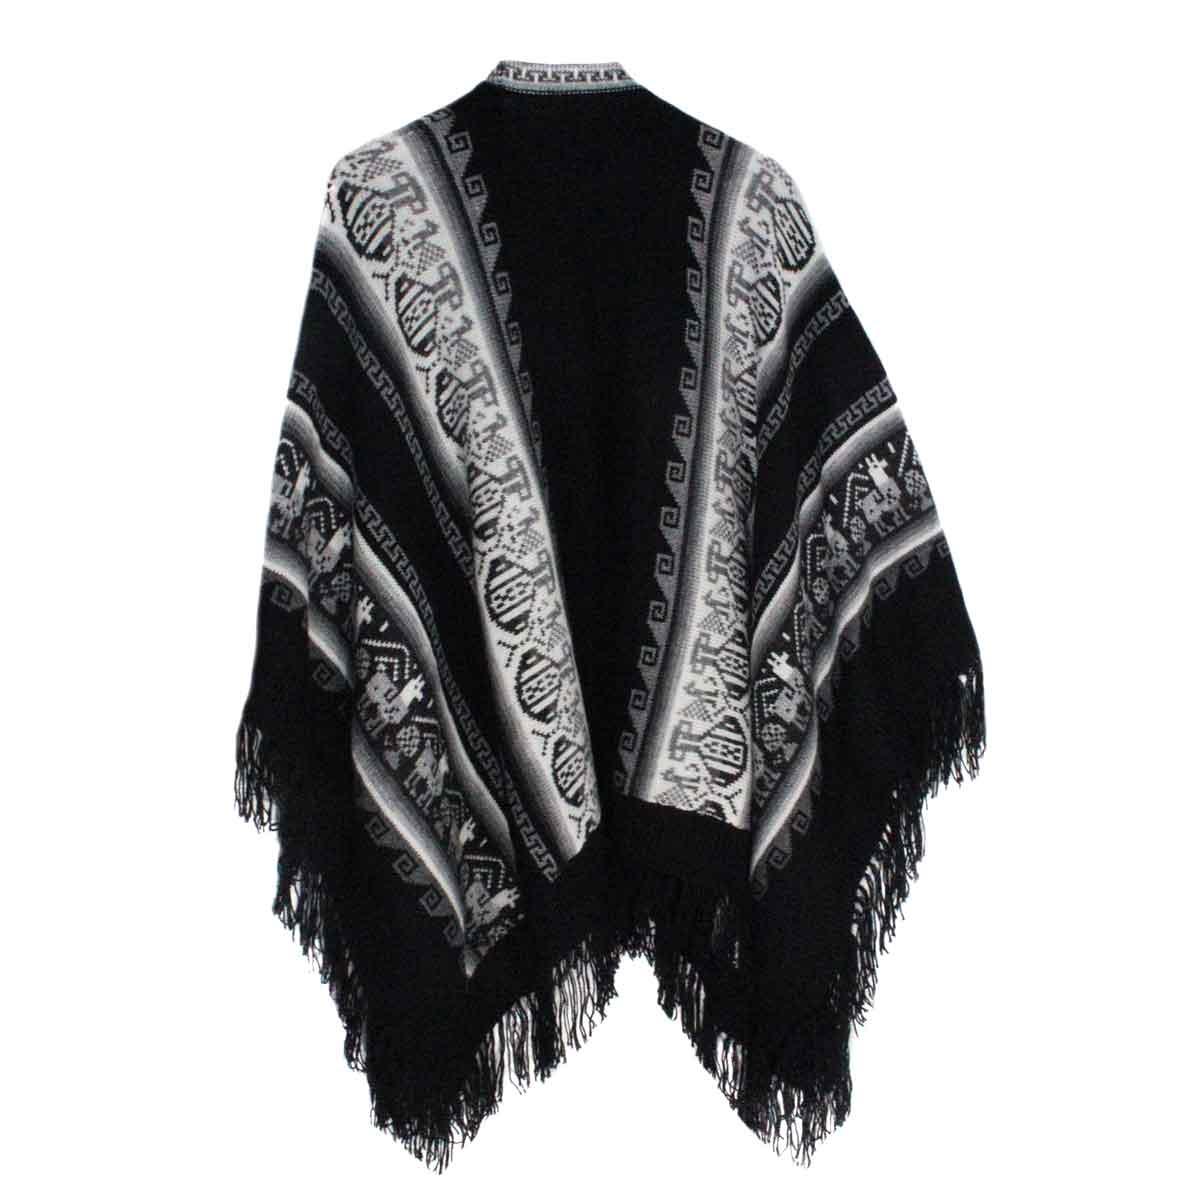 Inka-Products-Poncho Alpaga JAYWAY-Noir Motifs Ethniques-2